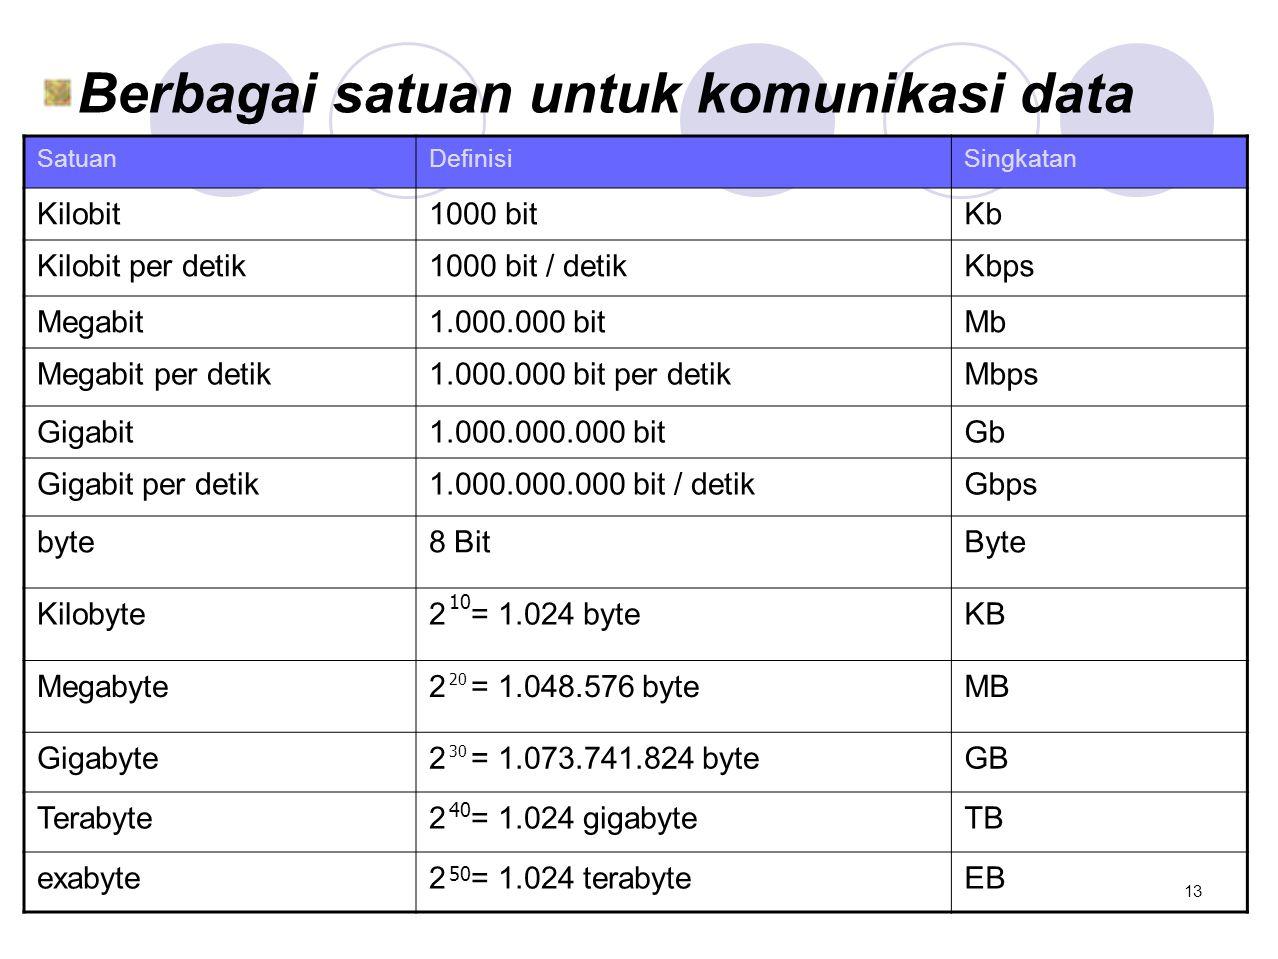 Berbagai satuan untuk komunikasi data SatuanDefinisiSingkatan Kilobit1000 bitKb Kilobit per detik1000 bit / detikKbps Megabit1.000.000 bitMb Megabit p